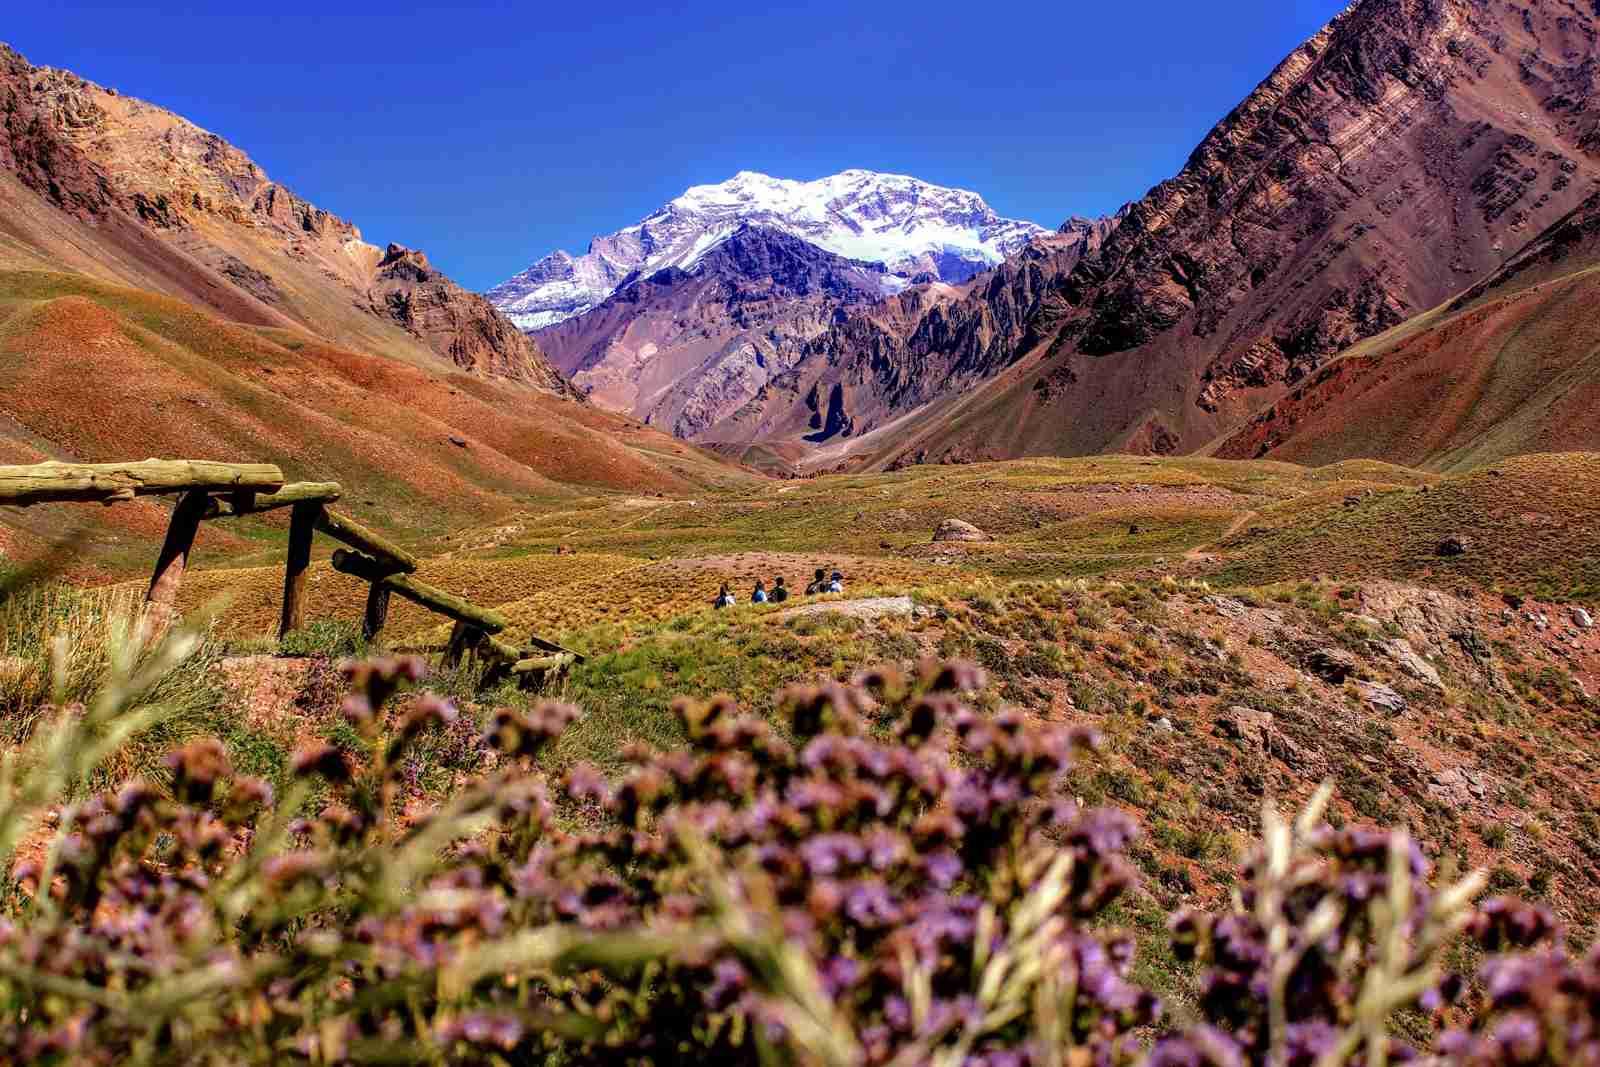 Aconcagua Park in Mendoza, Argentina. (Photo by Nicolas Perez/Unsplash)